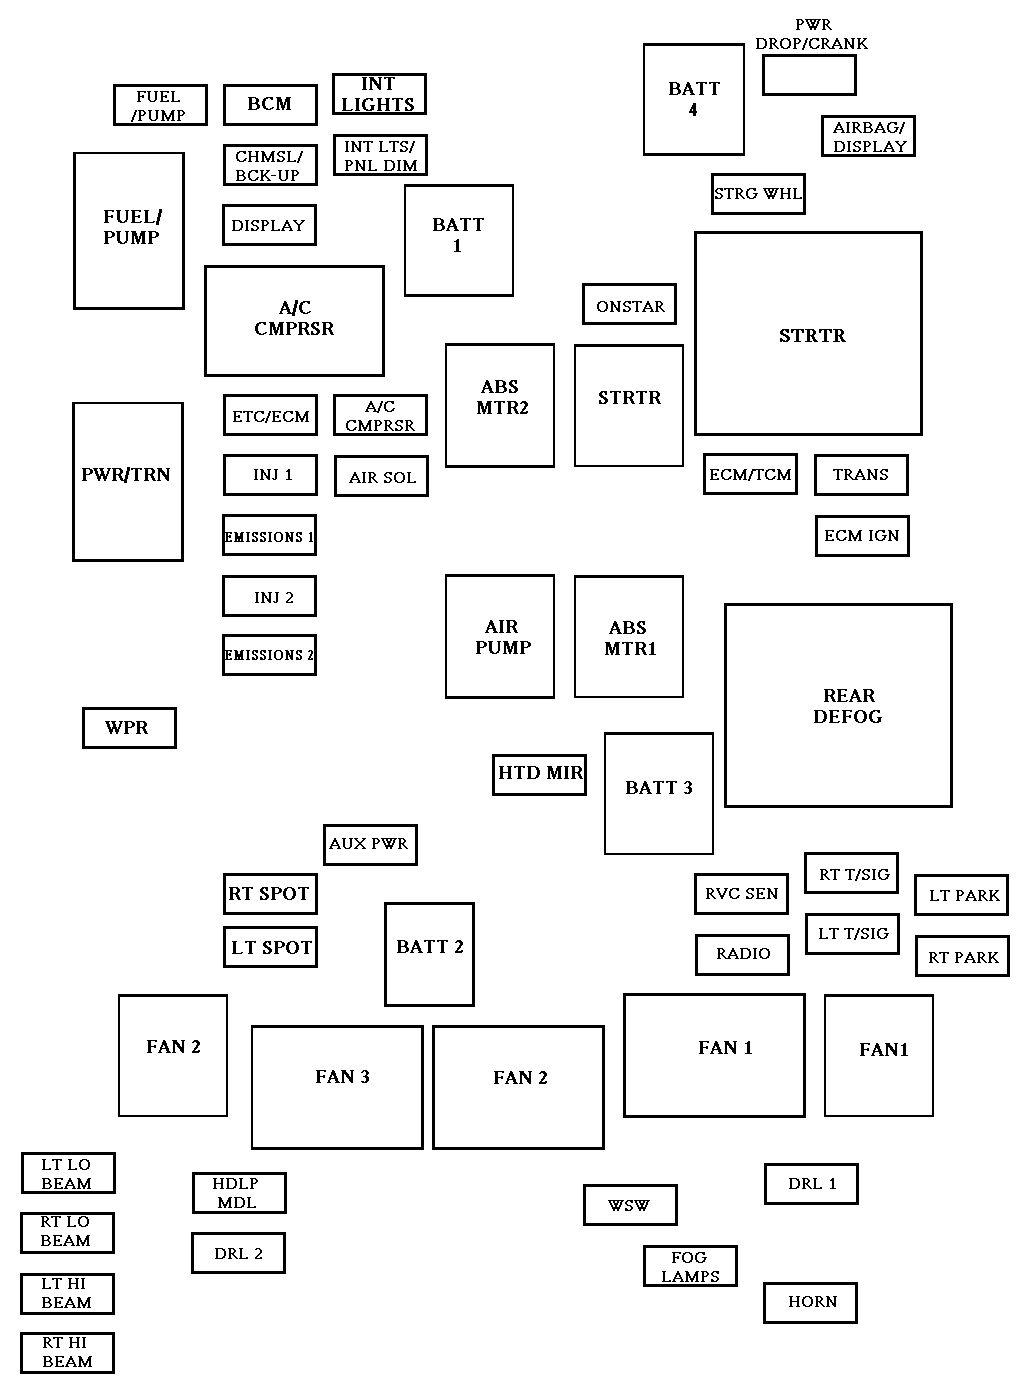 2008 chevy impala fuse diagram wiring diagram database rh 12 ghuttr nintendomonsen de 2008 chevy impala ss fuse box diagram